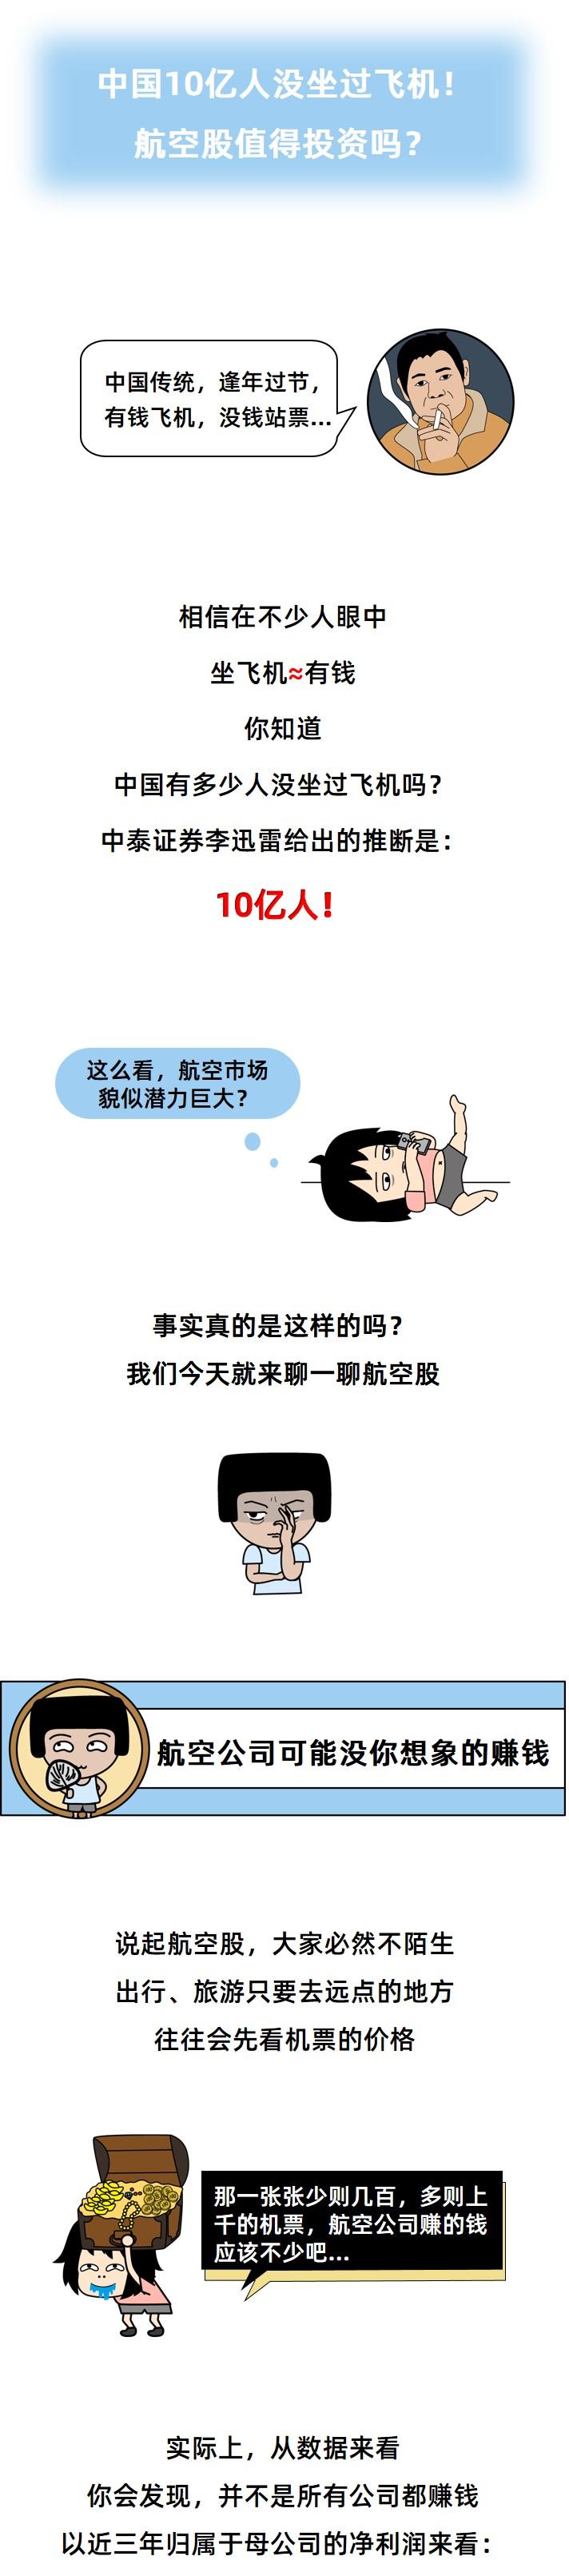 <b>小白学炒股 | 中国10亿人没坐过飞机!航空股值得投资吗?</b>